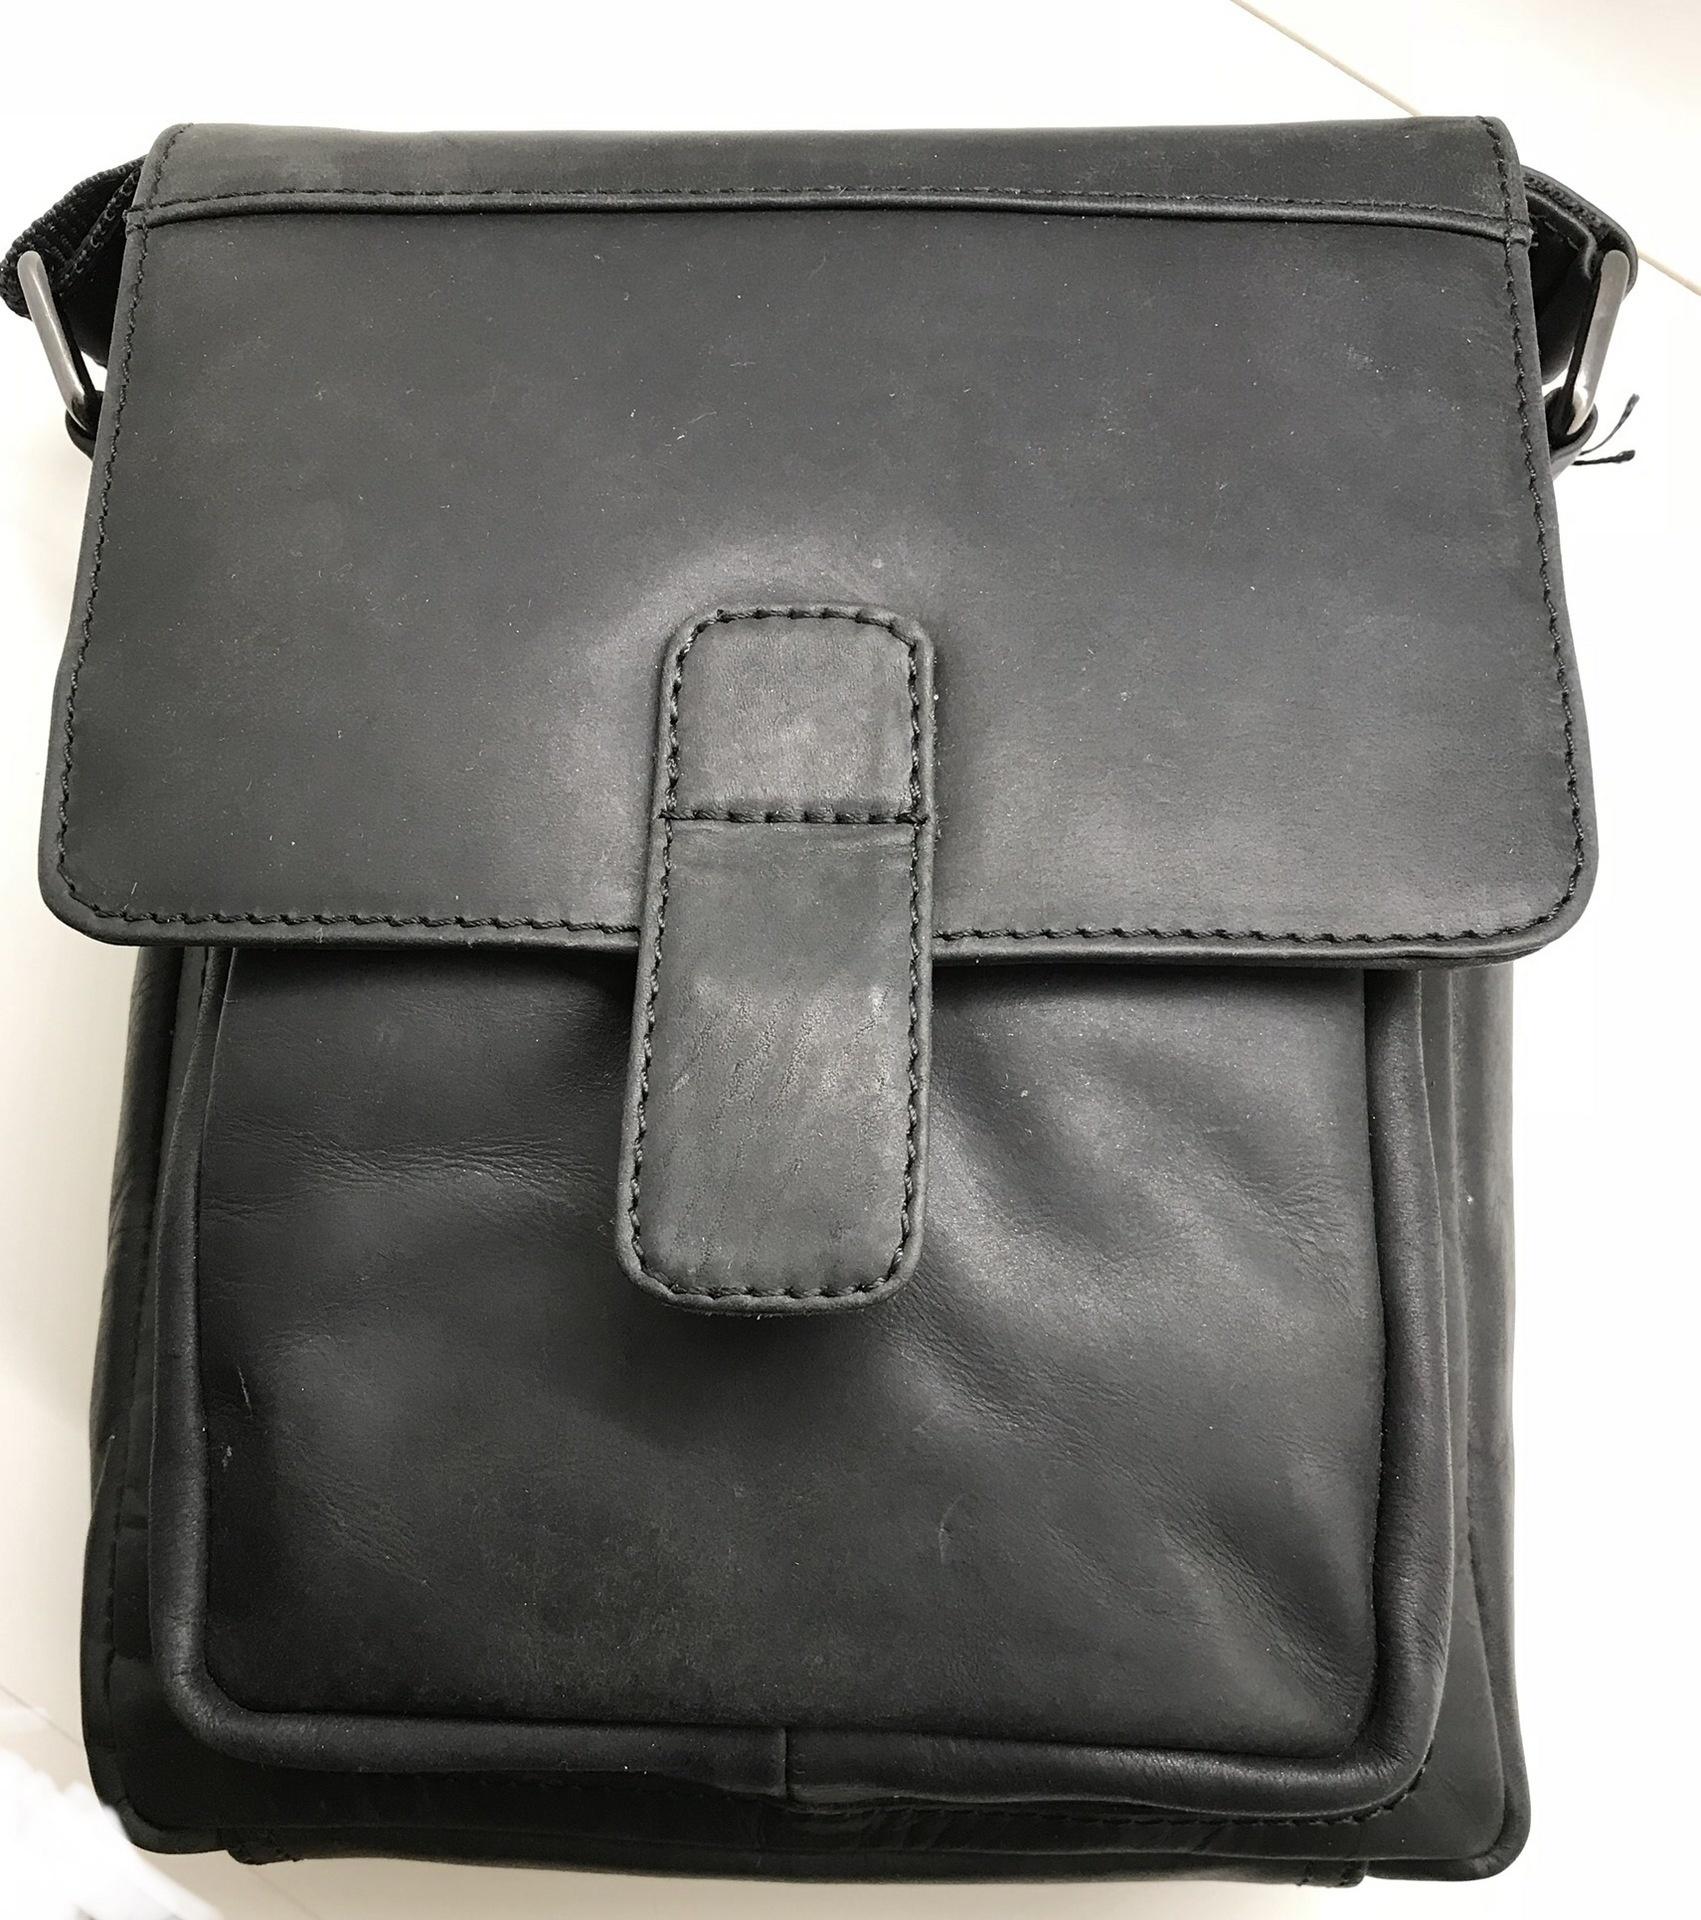 Rowallan Clyde Leather Single Tab Bag - Our Secret  c010dc7f28219